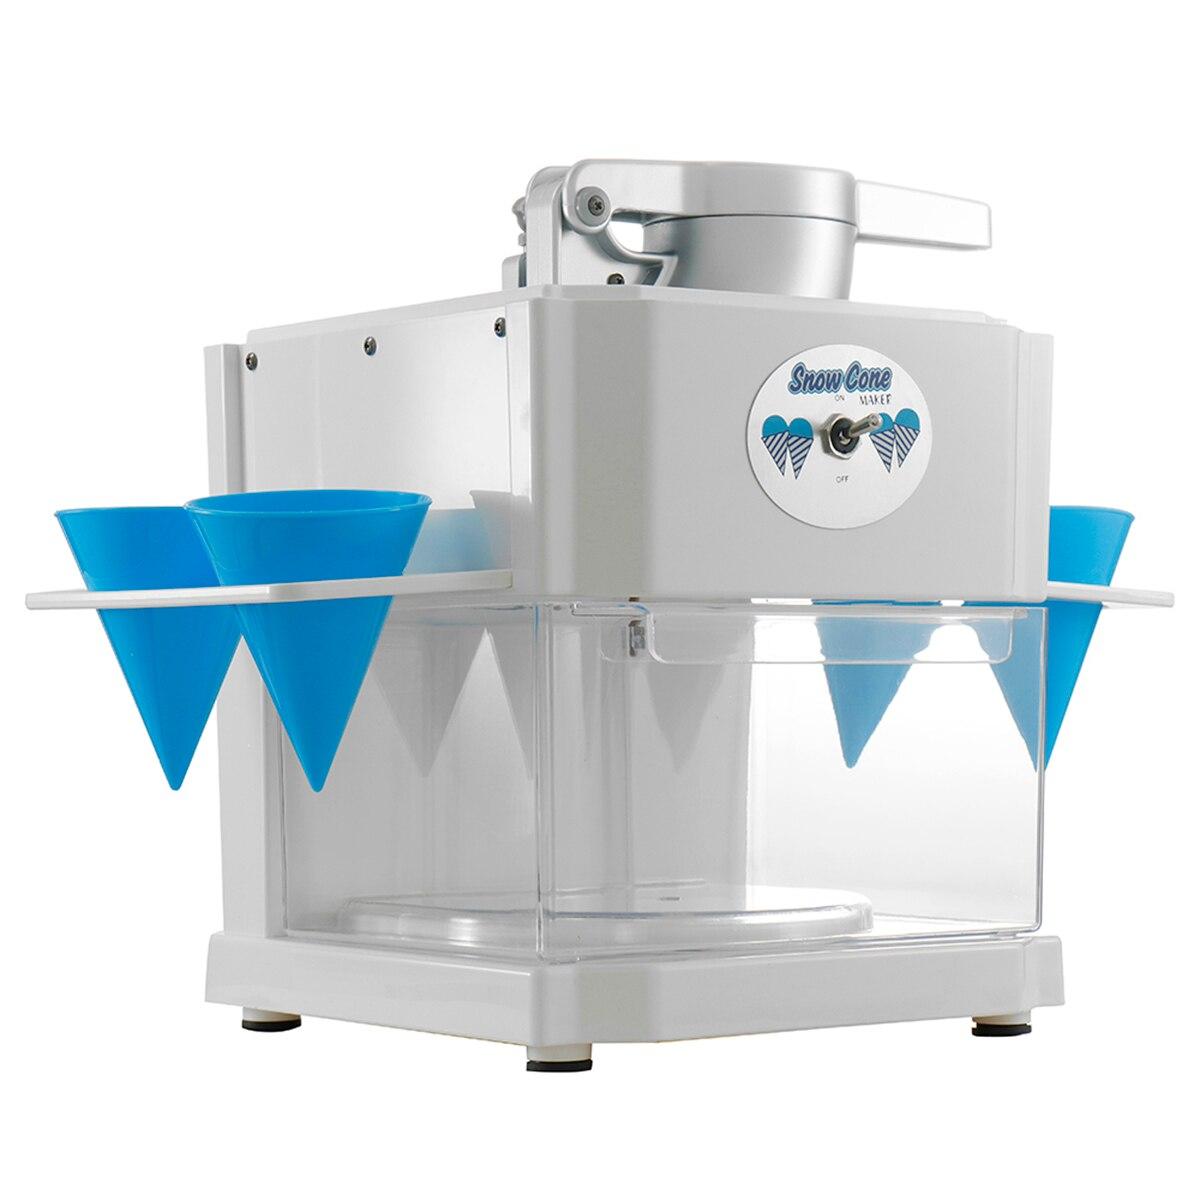 Electric Ice Crusher Shaver Maker 3L DIY Slushy Sand Block Break Machine Home Kitchen Tools for Shaved Ice/Snow Cones/Slushies